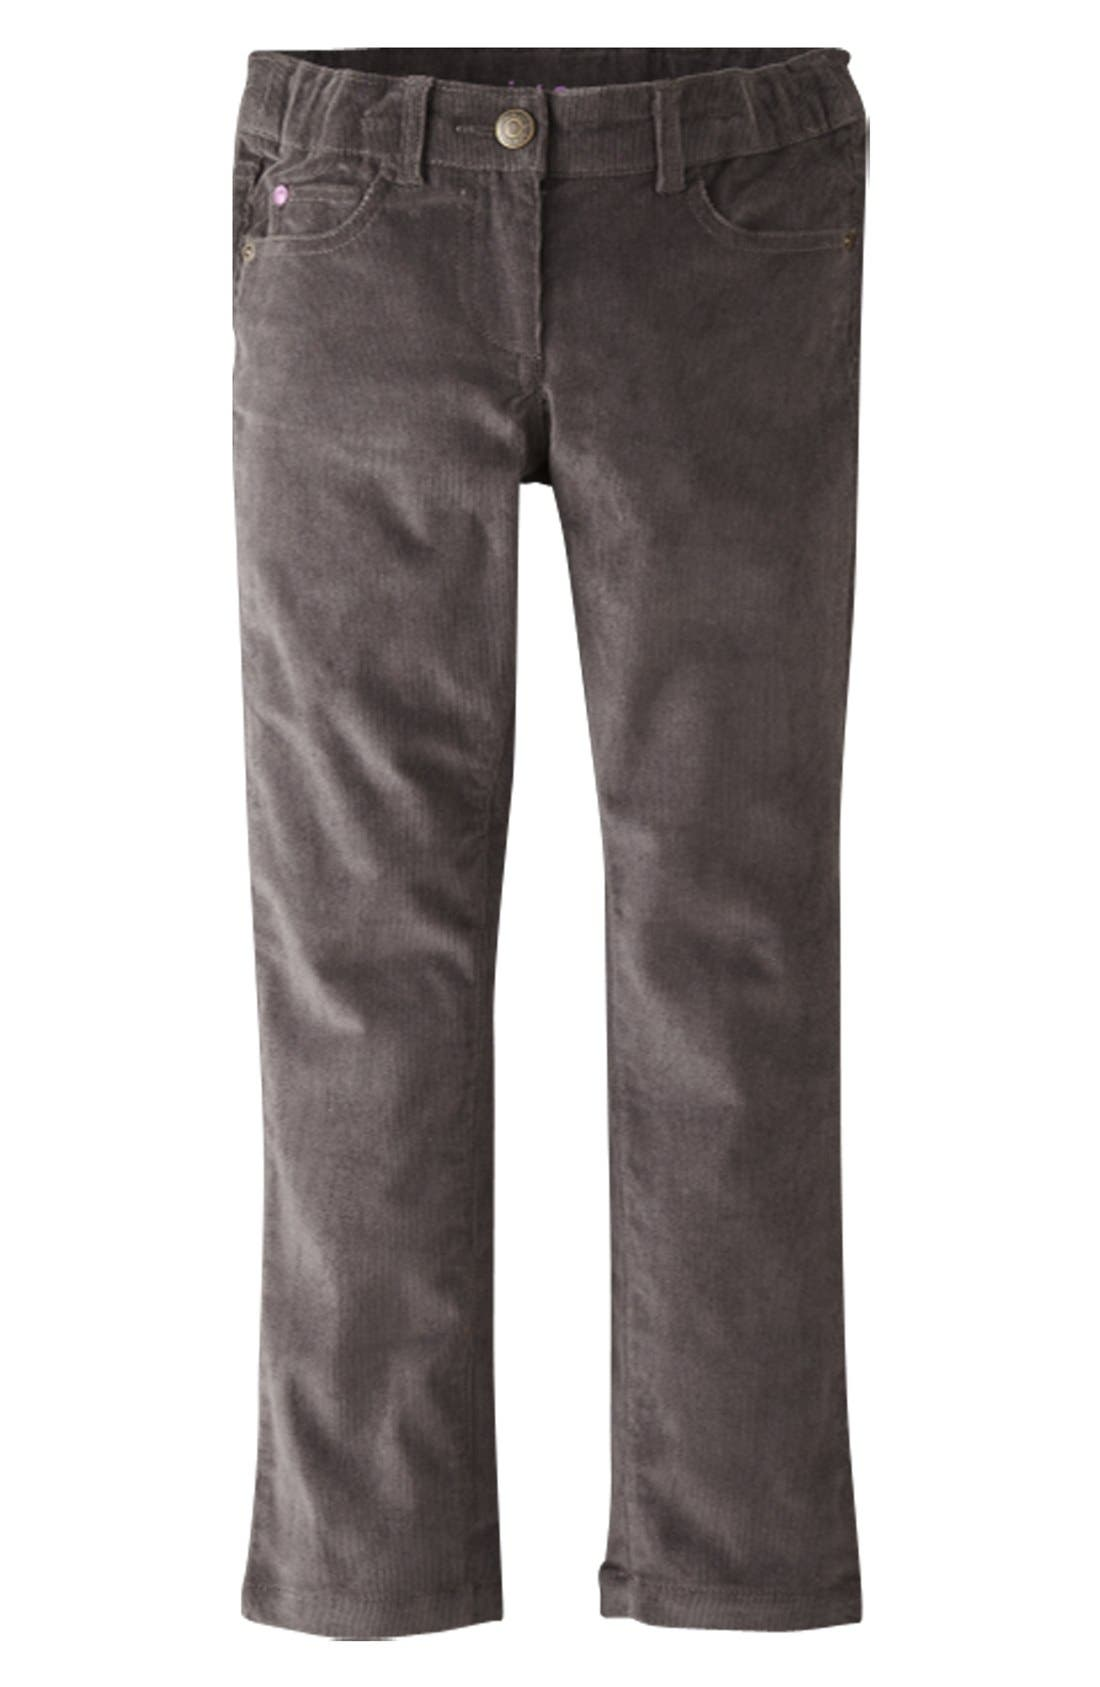 Alternate Image 1 Selected - Mini Boden Slim Fit Corduroy Pants (Toddler Girls, Little Girls & Big Girls)